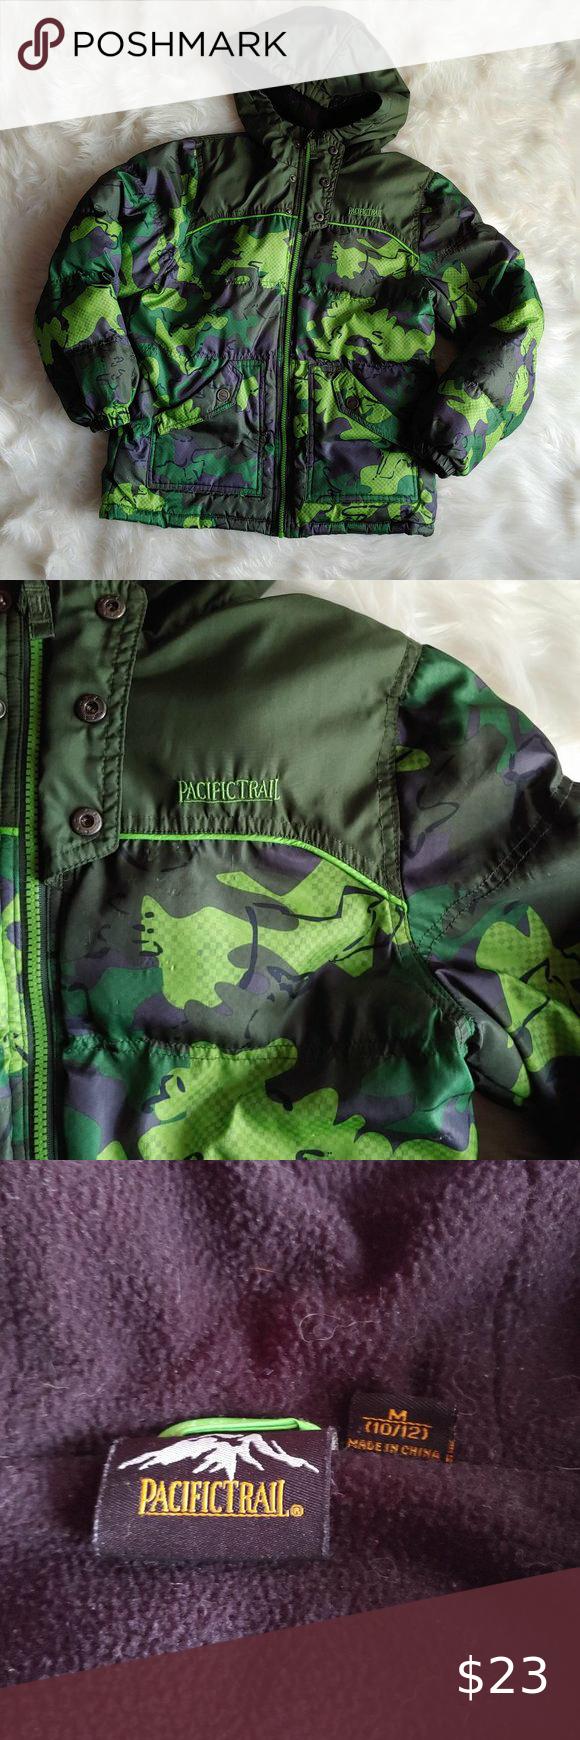 Boy S Pacific Trails Camo Puffer Jacket Camo Puffer Jacket Clothes Design Camo Colors [ 1740 x 580 Pixel ]